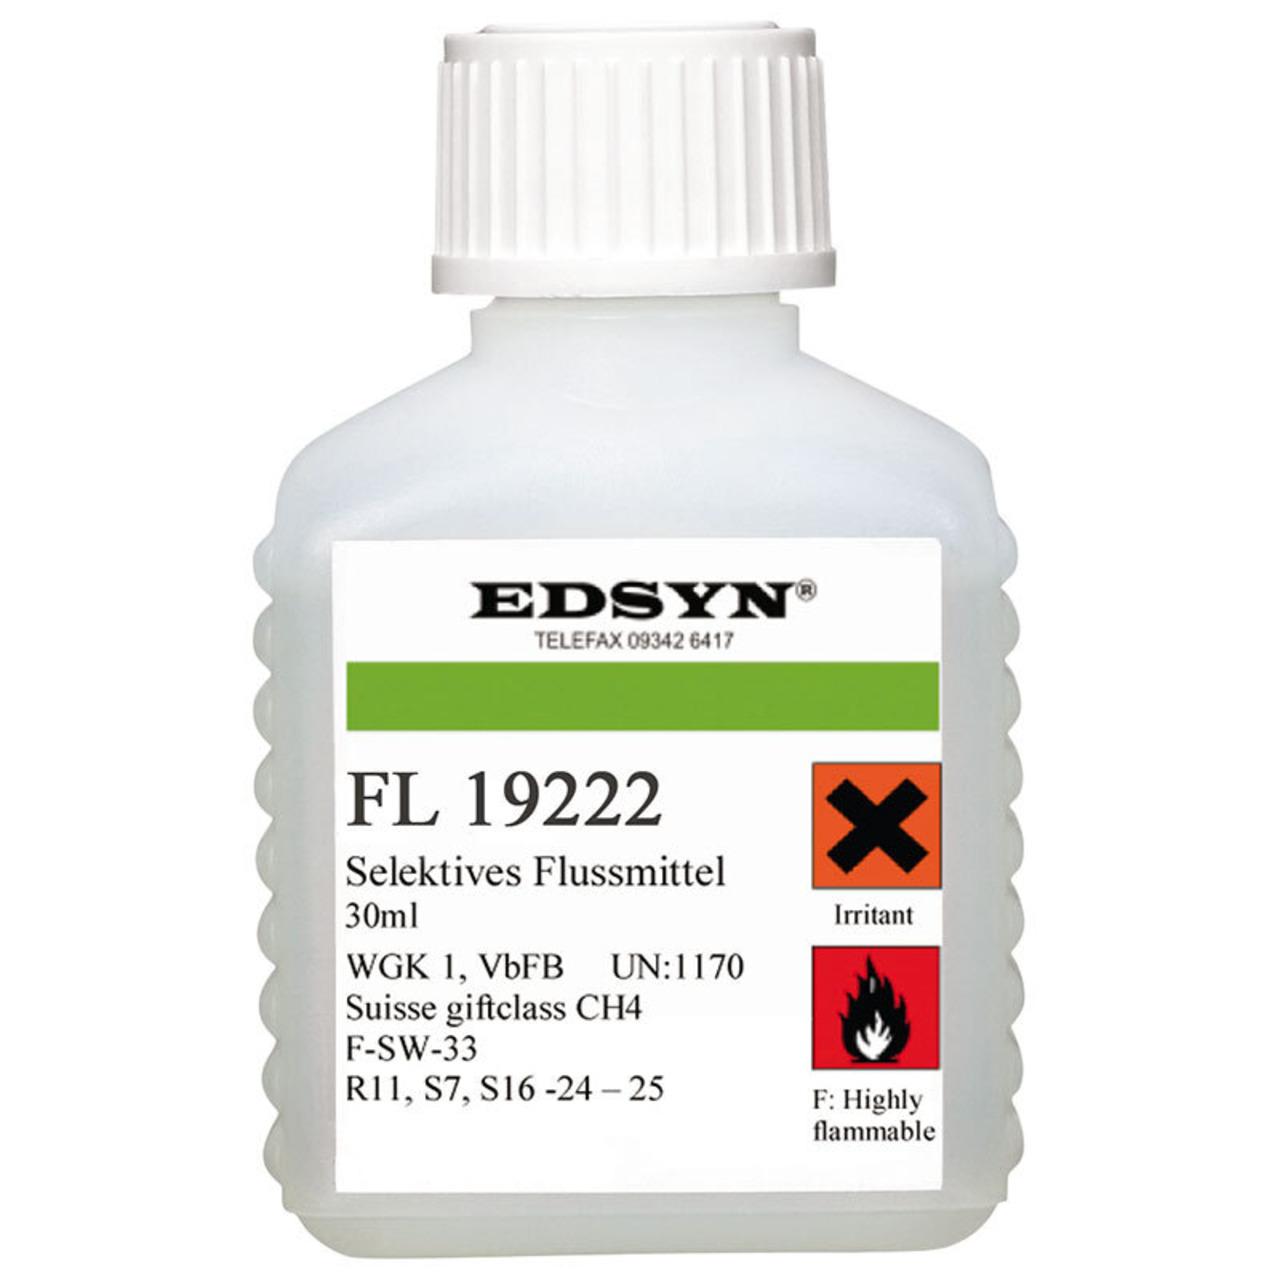 Edsyn Fluxi Flussmittel in Pinselflasche- 30 ml